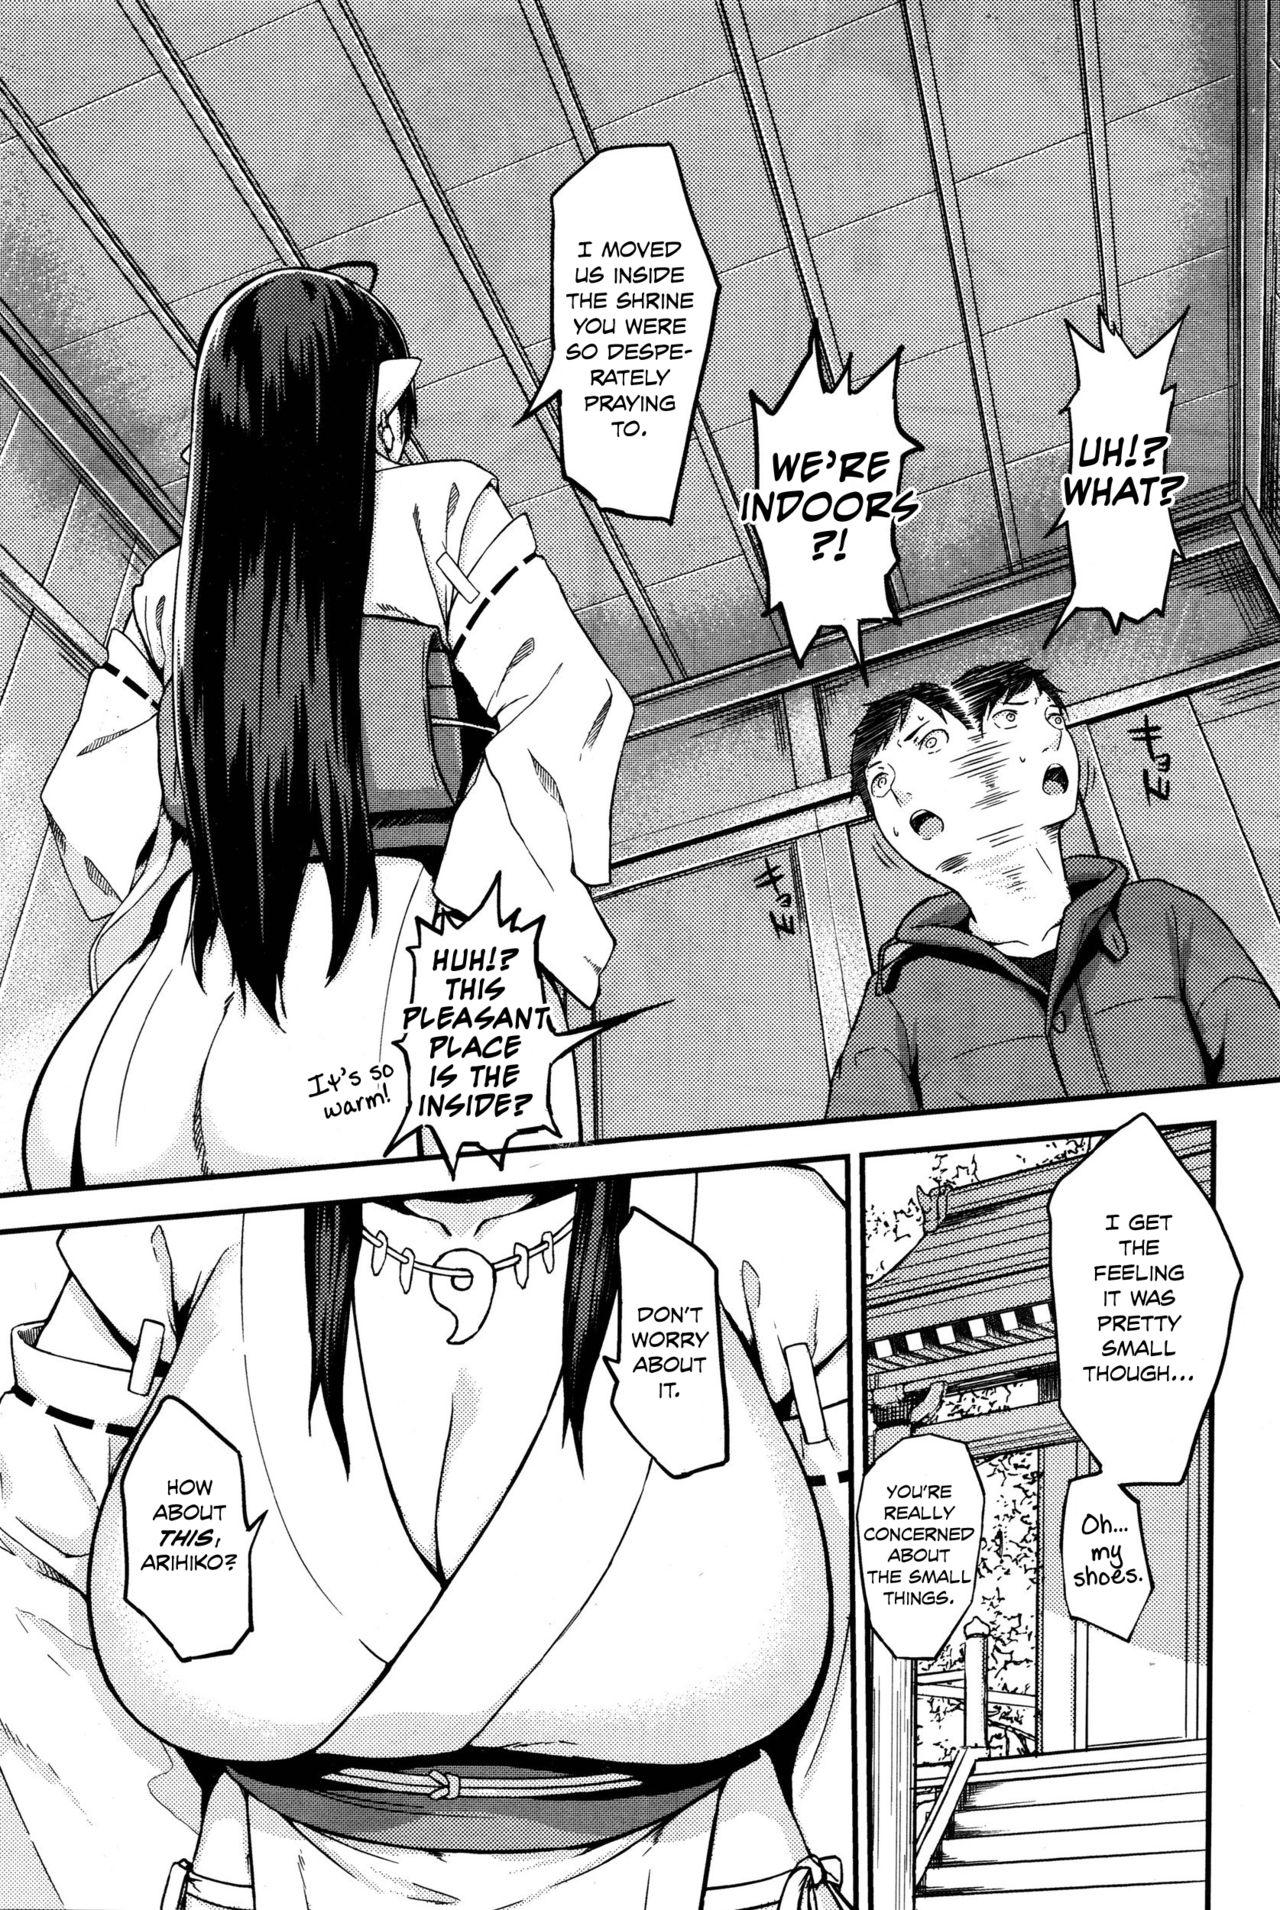 [obmas] Onegai! Onigami-sama♥ - Please! Fearful God♥ [COMIC BAVEL 2016-01] [English] [Noraneko] 4